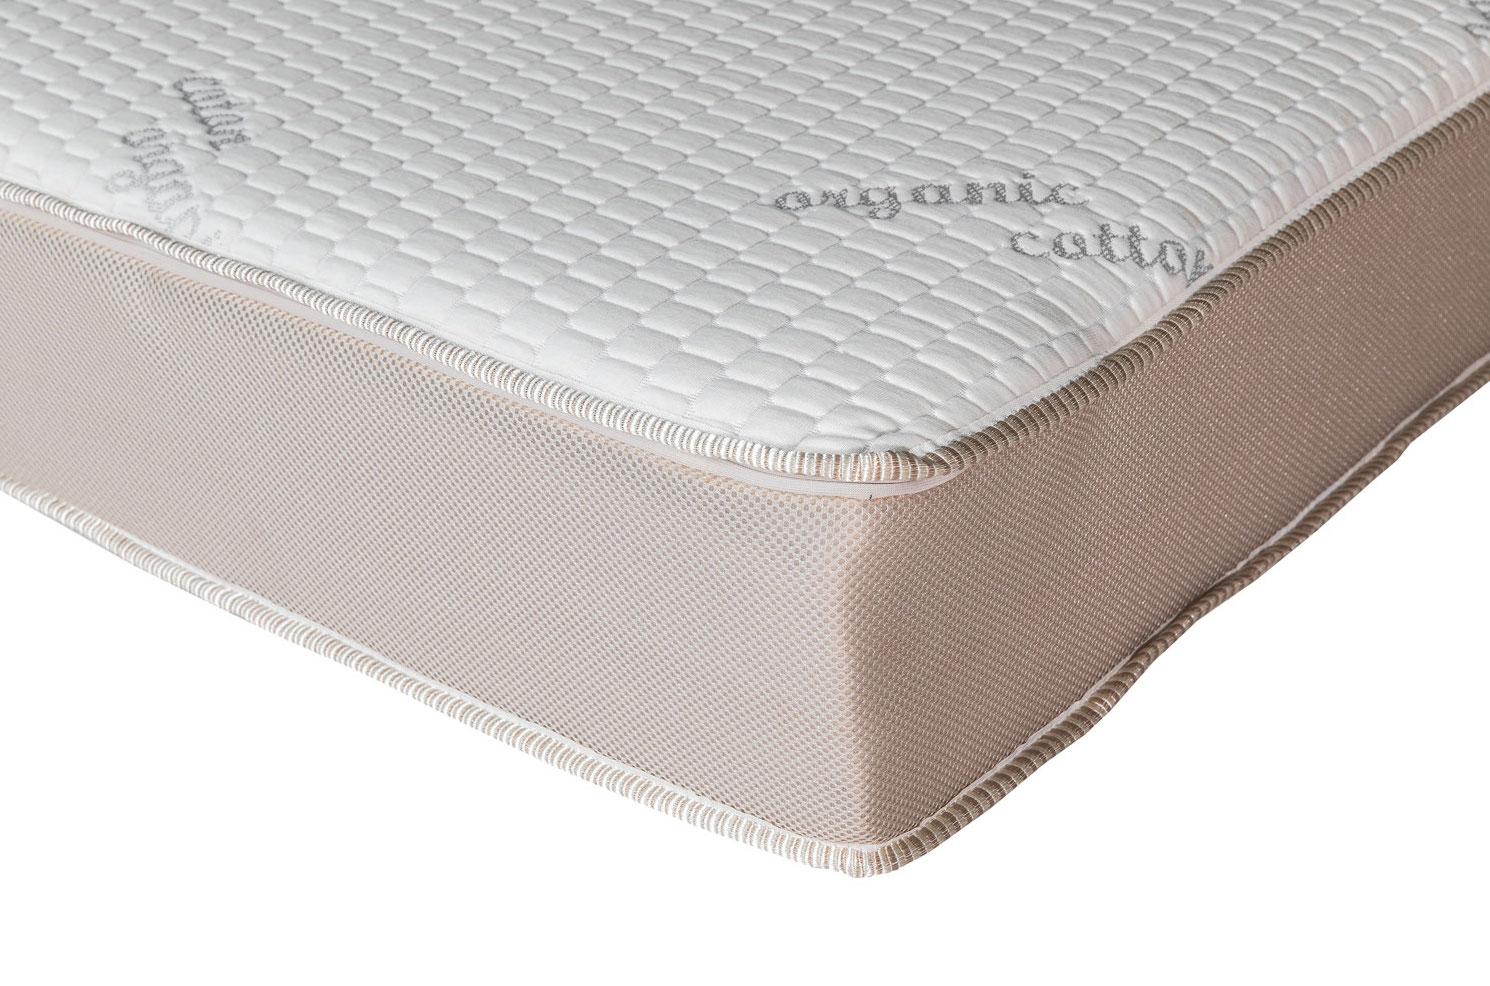 simmons crib mattresses - simmons organic touch dual sided crib mattress